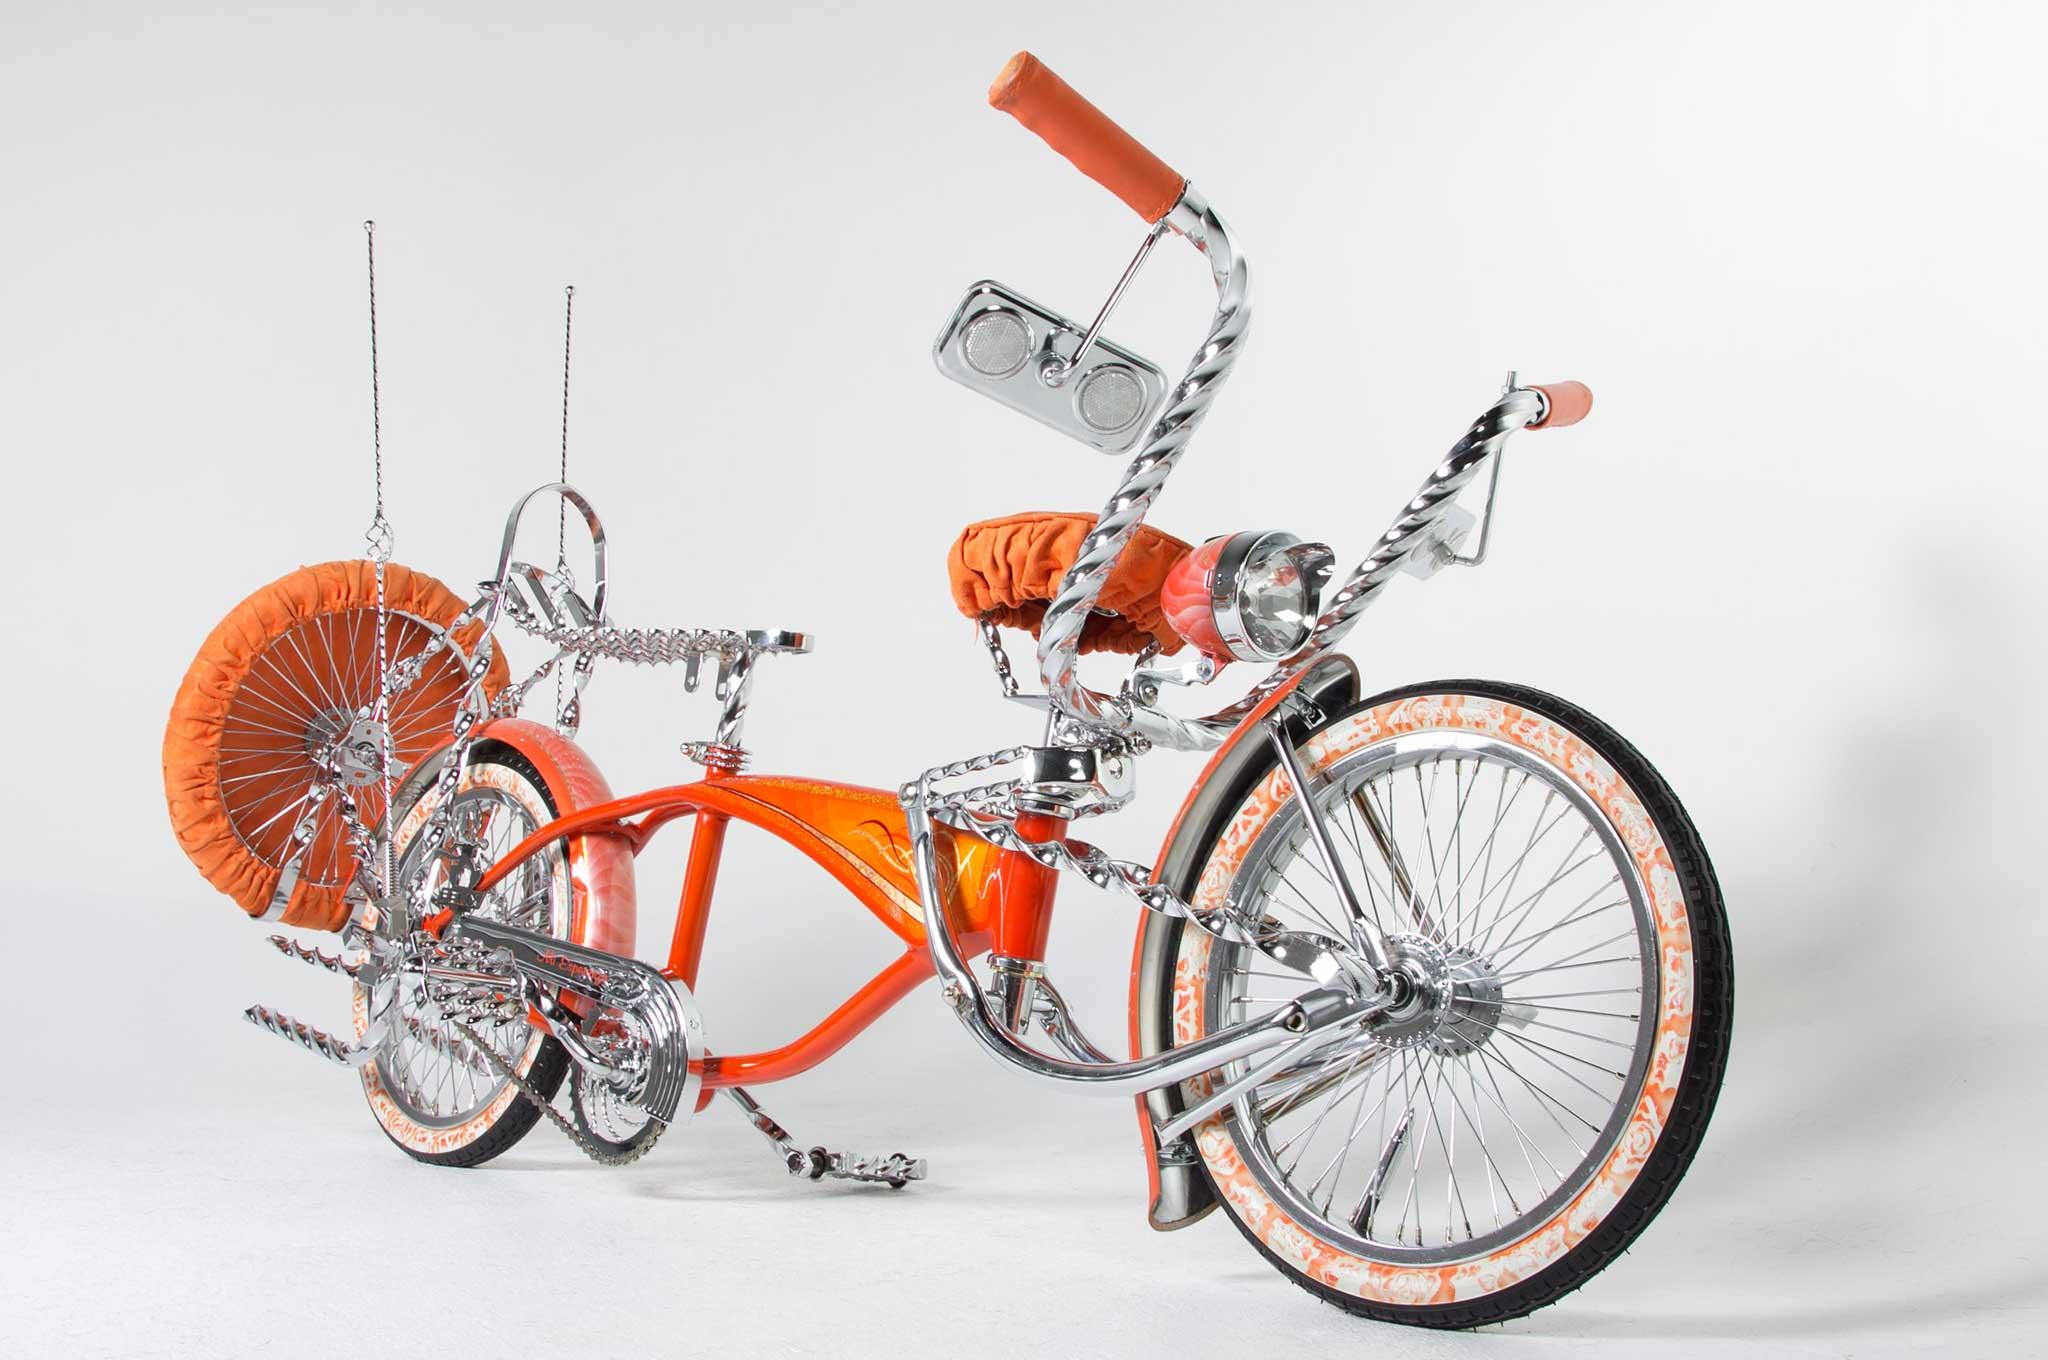 1996-lowrider-bike-side-view